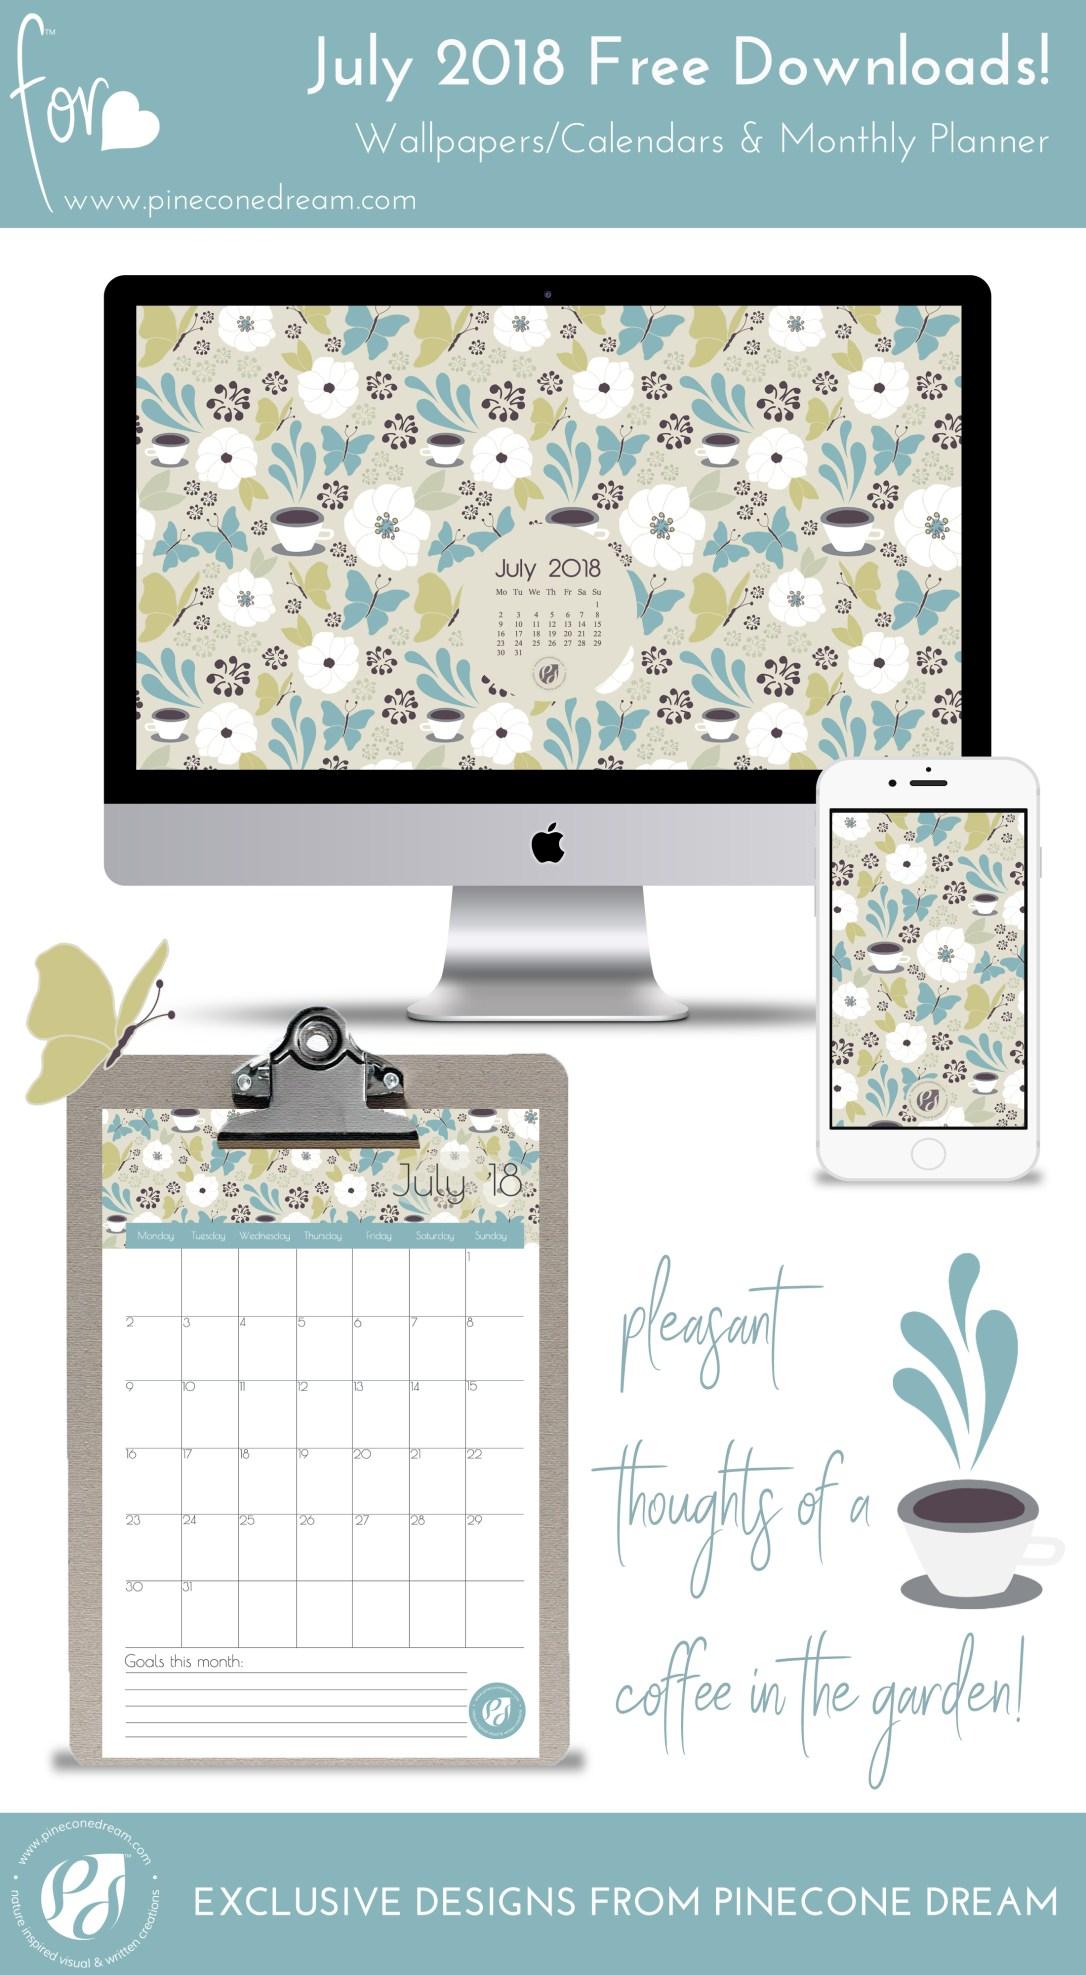 Calendar Planner Wallpaper : July free wallpapers calendars printable planner